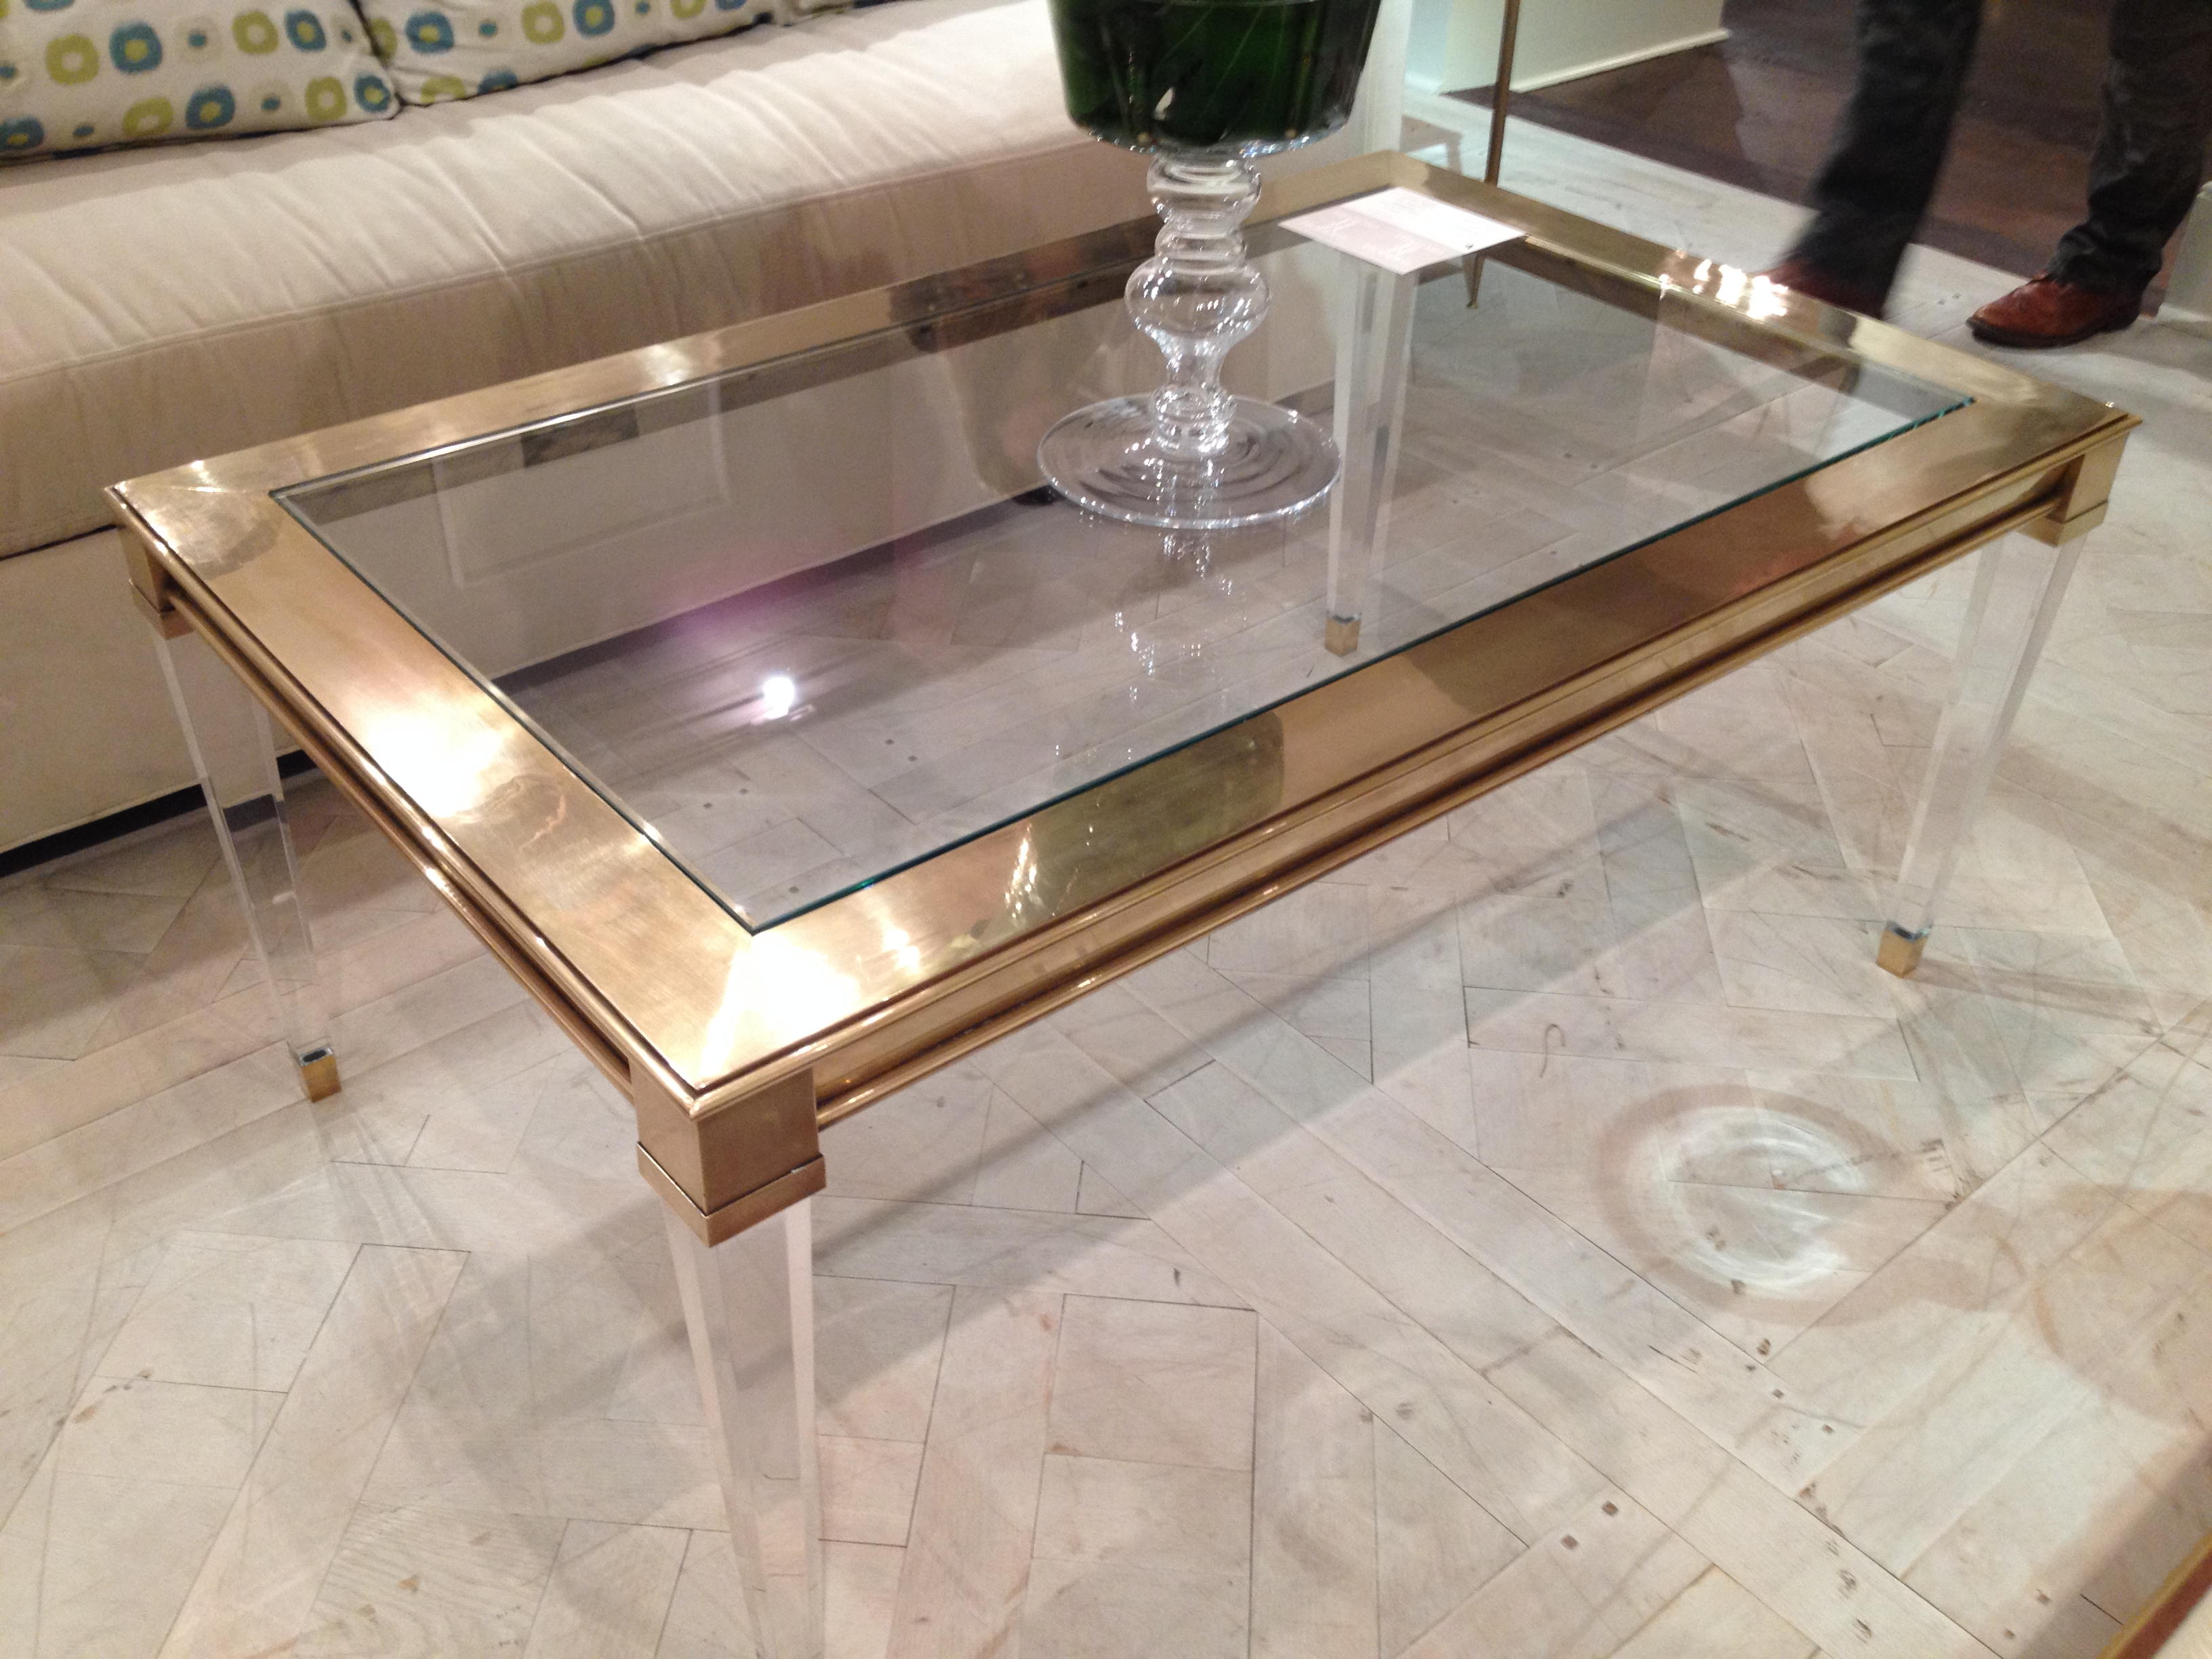 2019 Salma Acrylic And Brass Coffee Table – Mecox Gardens For Acrylic Glass And Brass Coffee Tables (View 8 of 20)